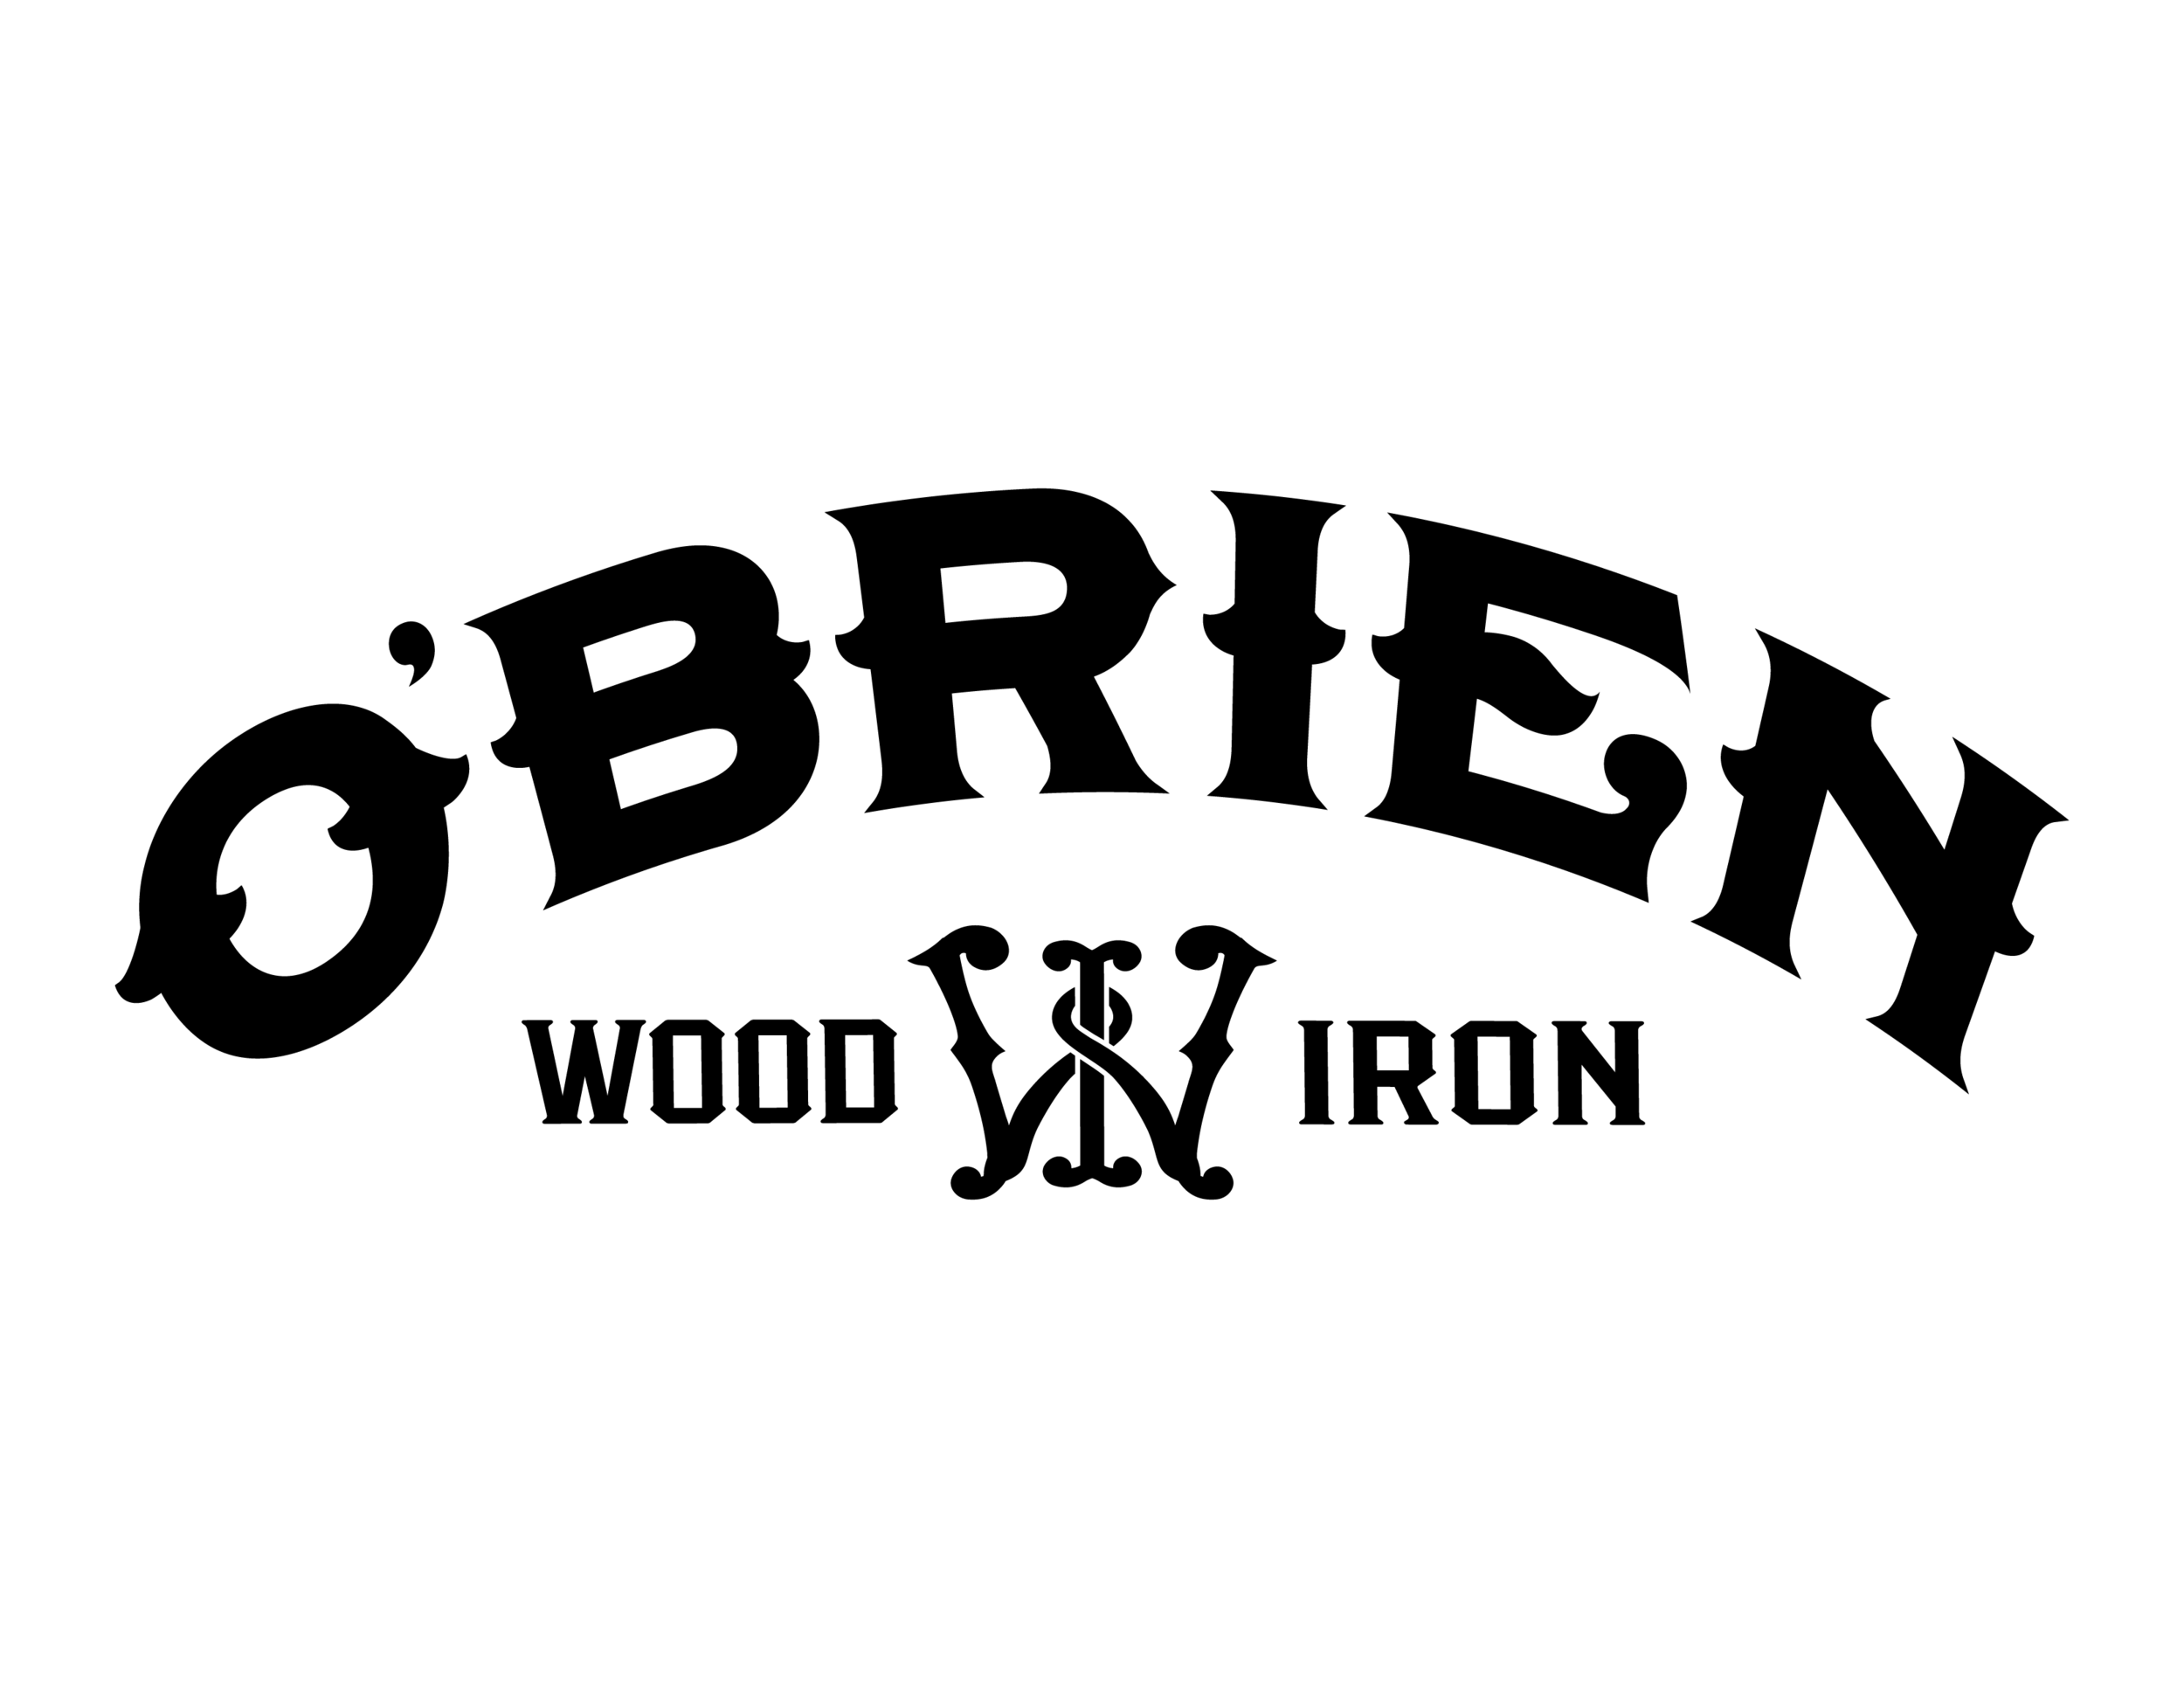 Obrien-Logo-transparent-01.png